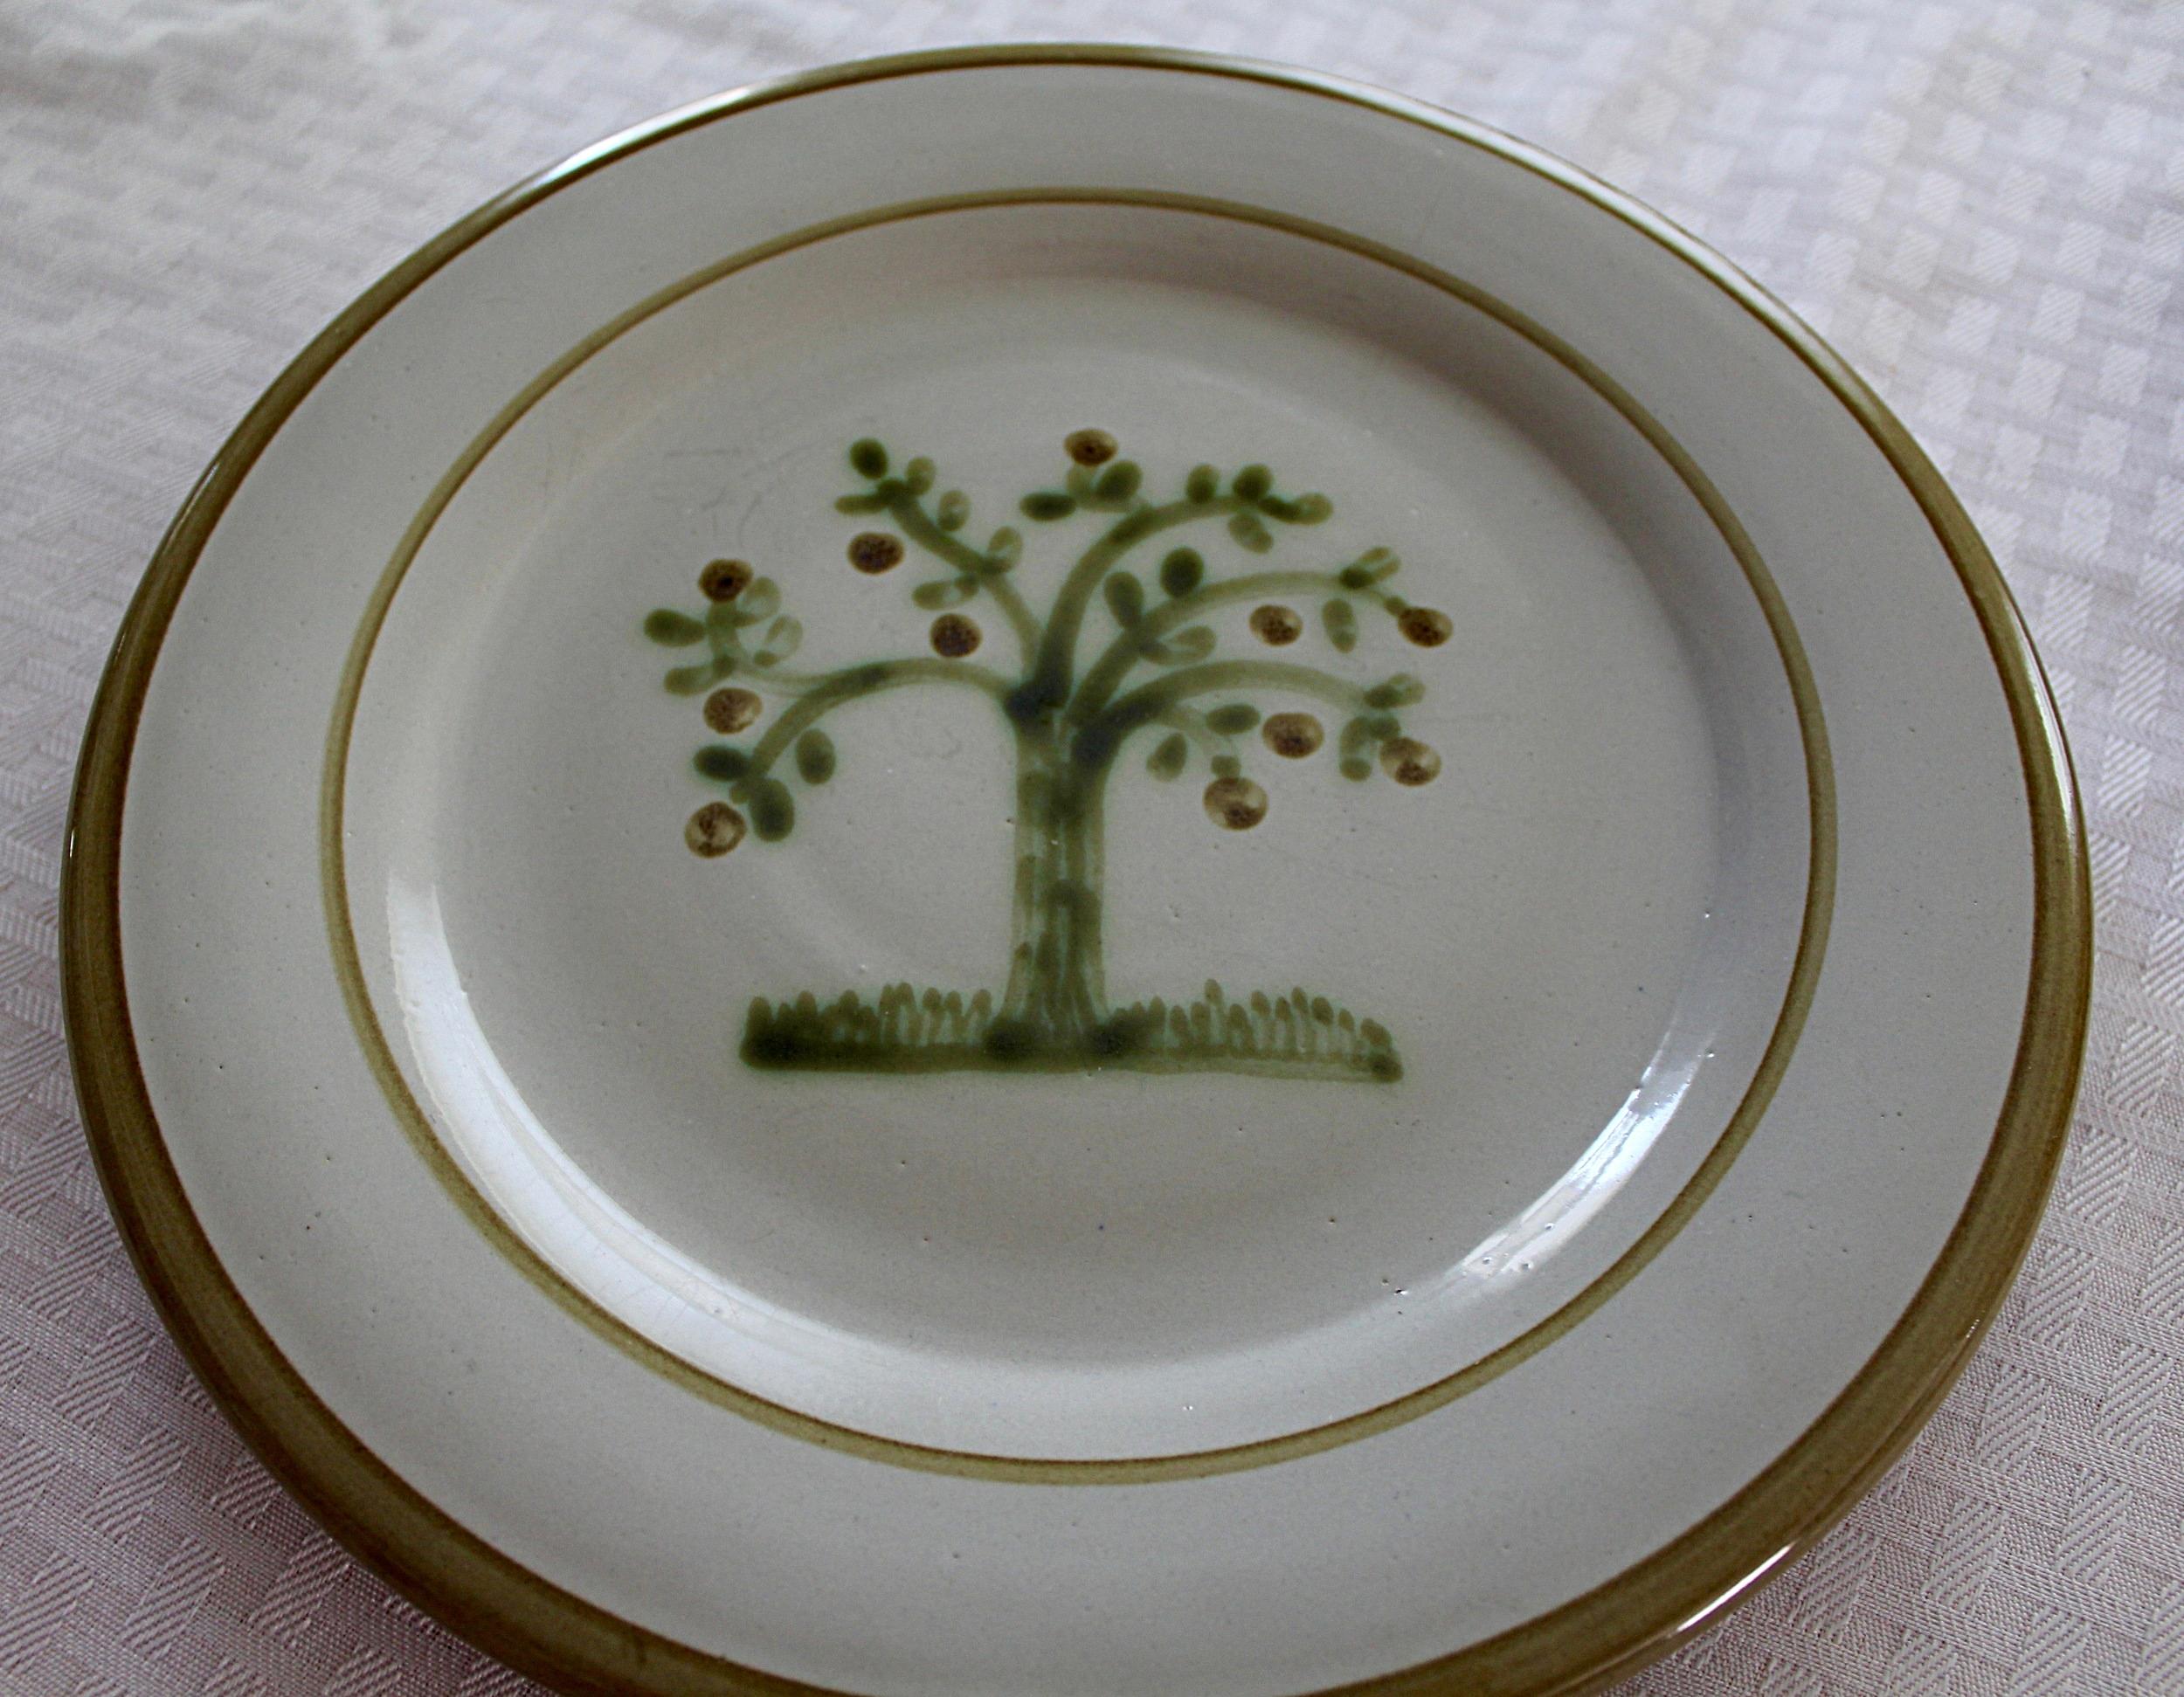 Louisville Stoneware for Pleasant Hill pottery   HerKentucky.com